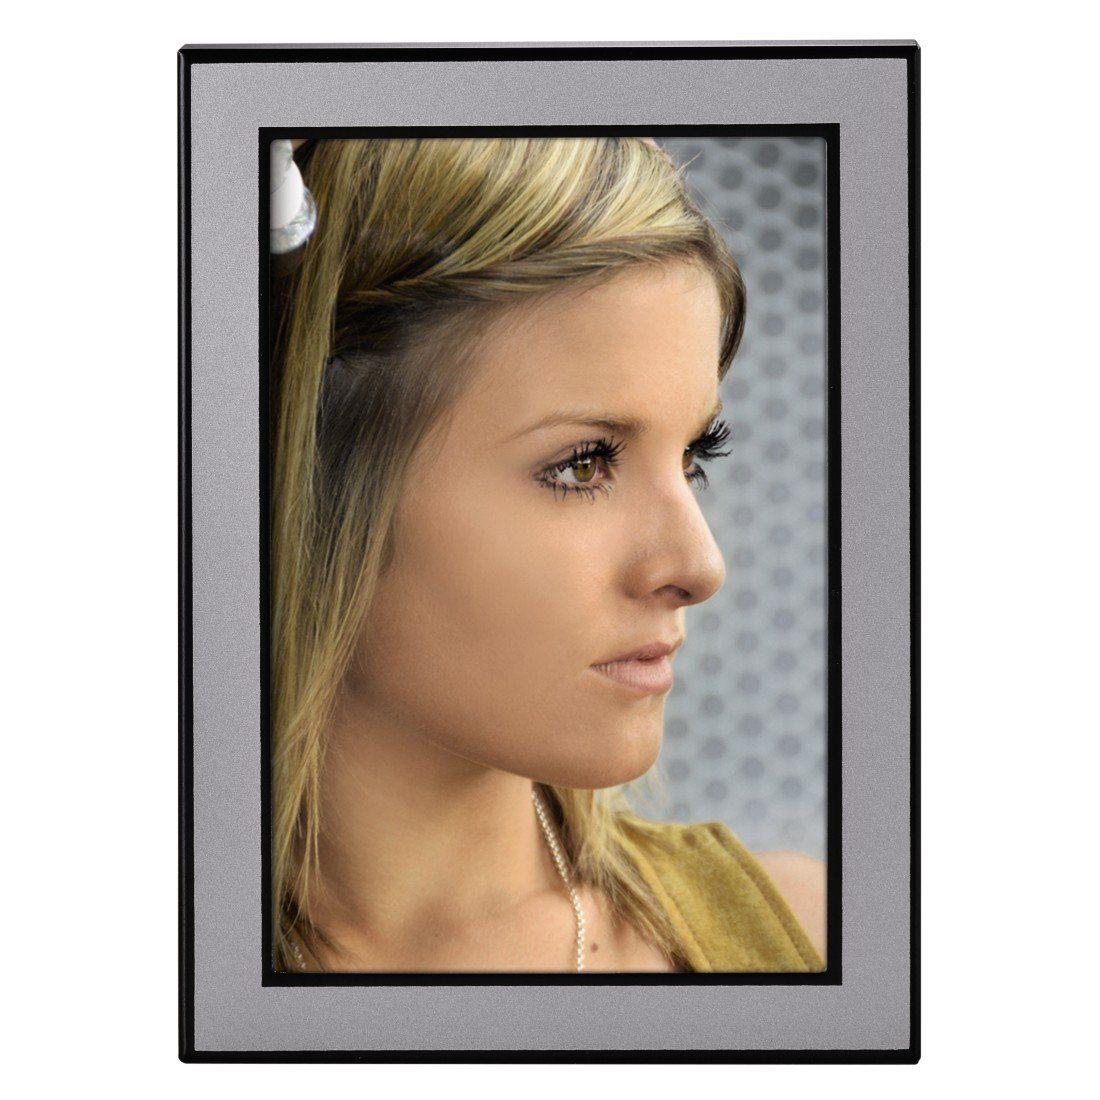 Hama Porträtrahmen Philadelphia, 10 x 15 cm, Silber/Schwarz